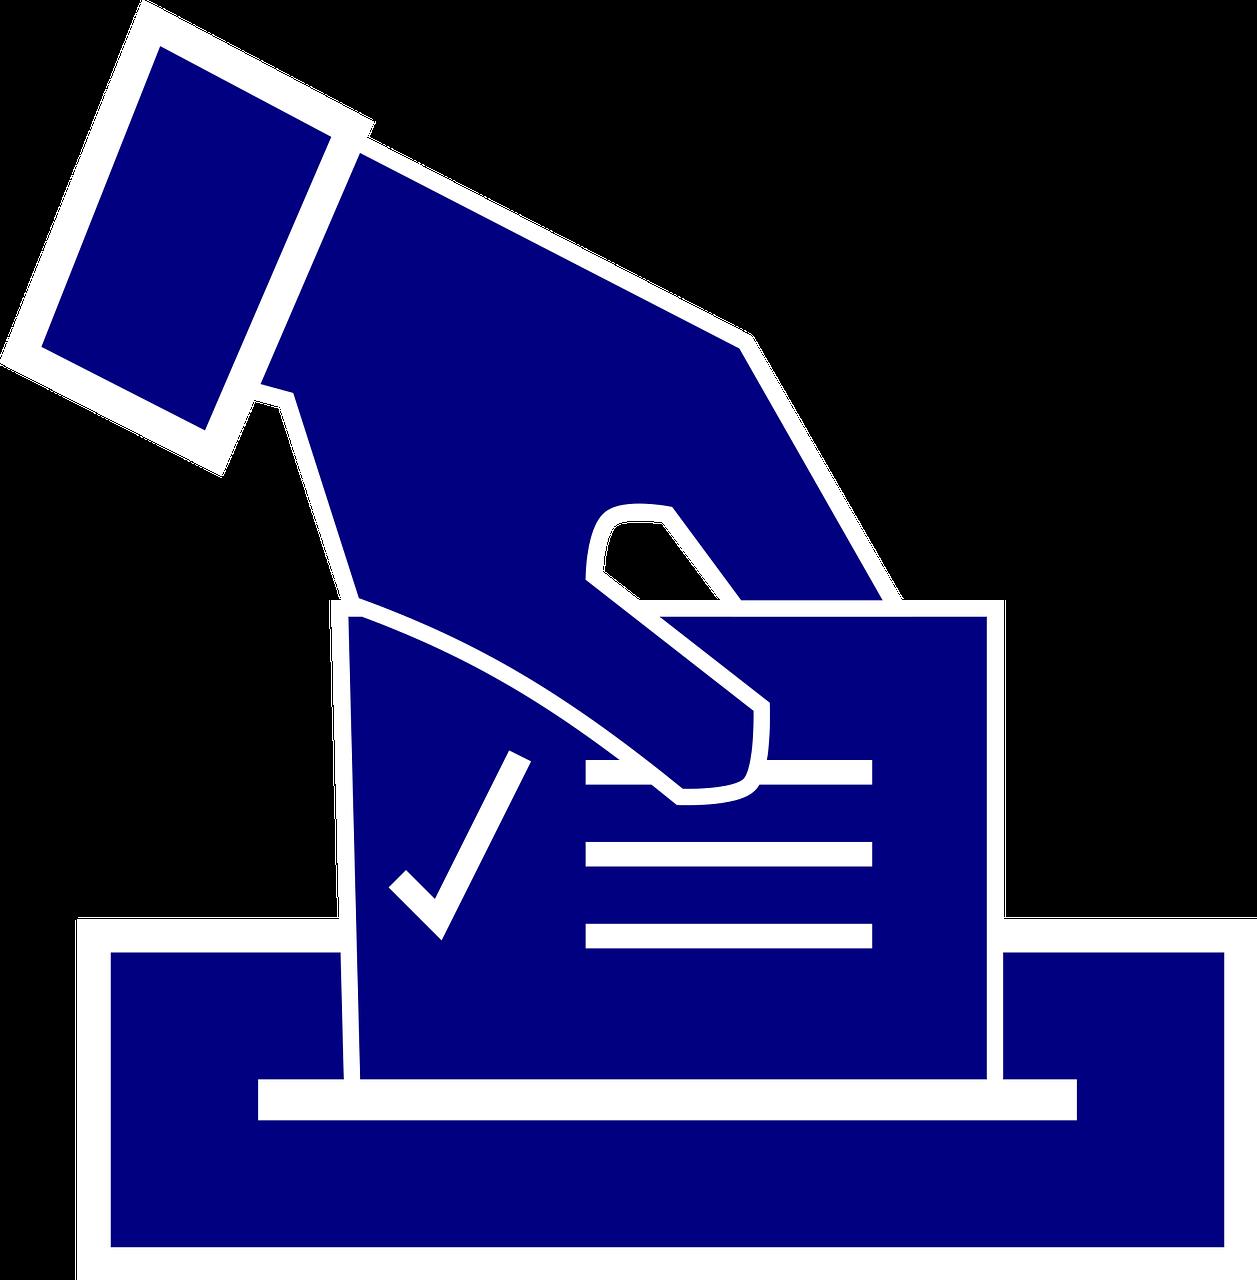 Symbolbild-Wahlurne